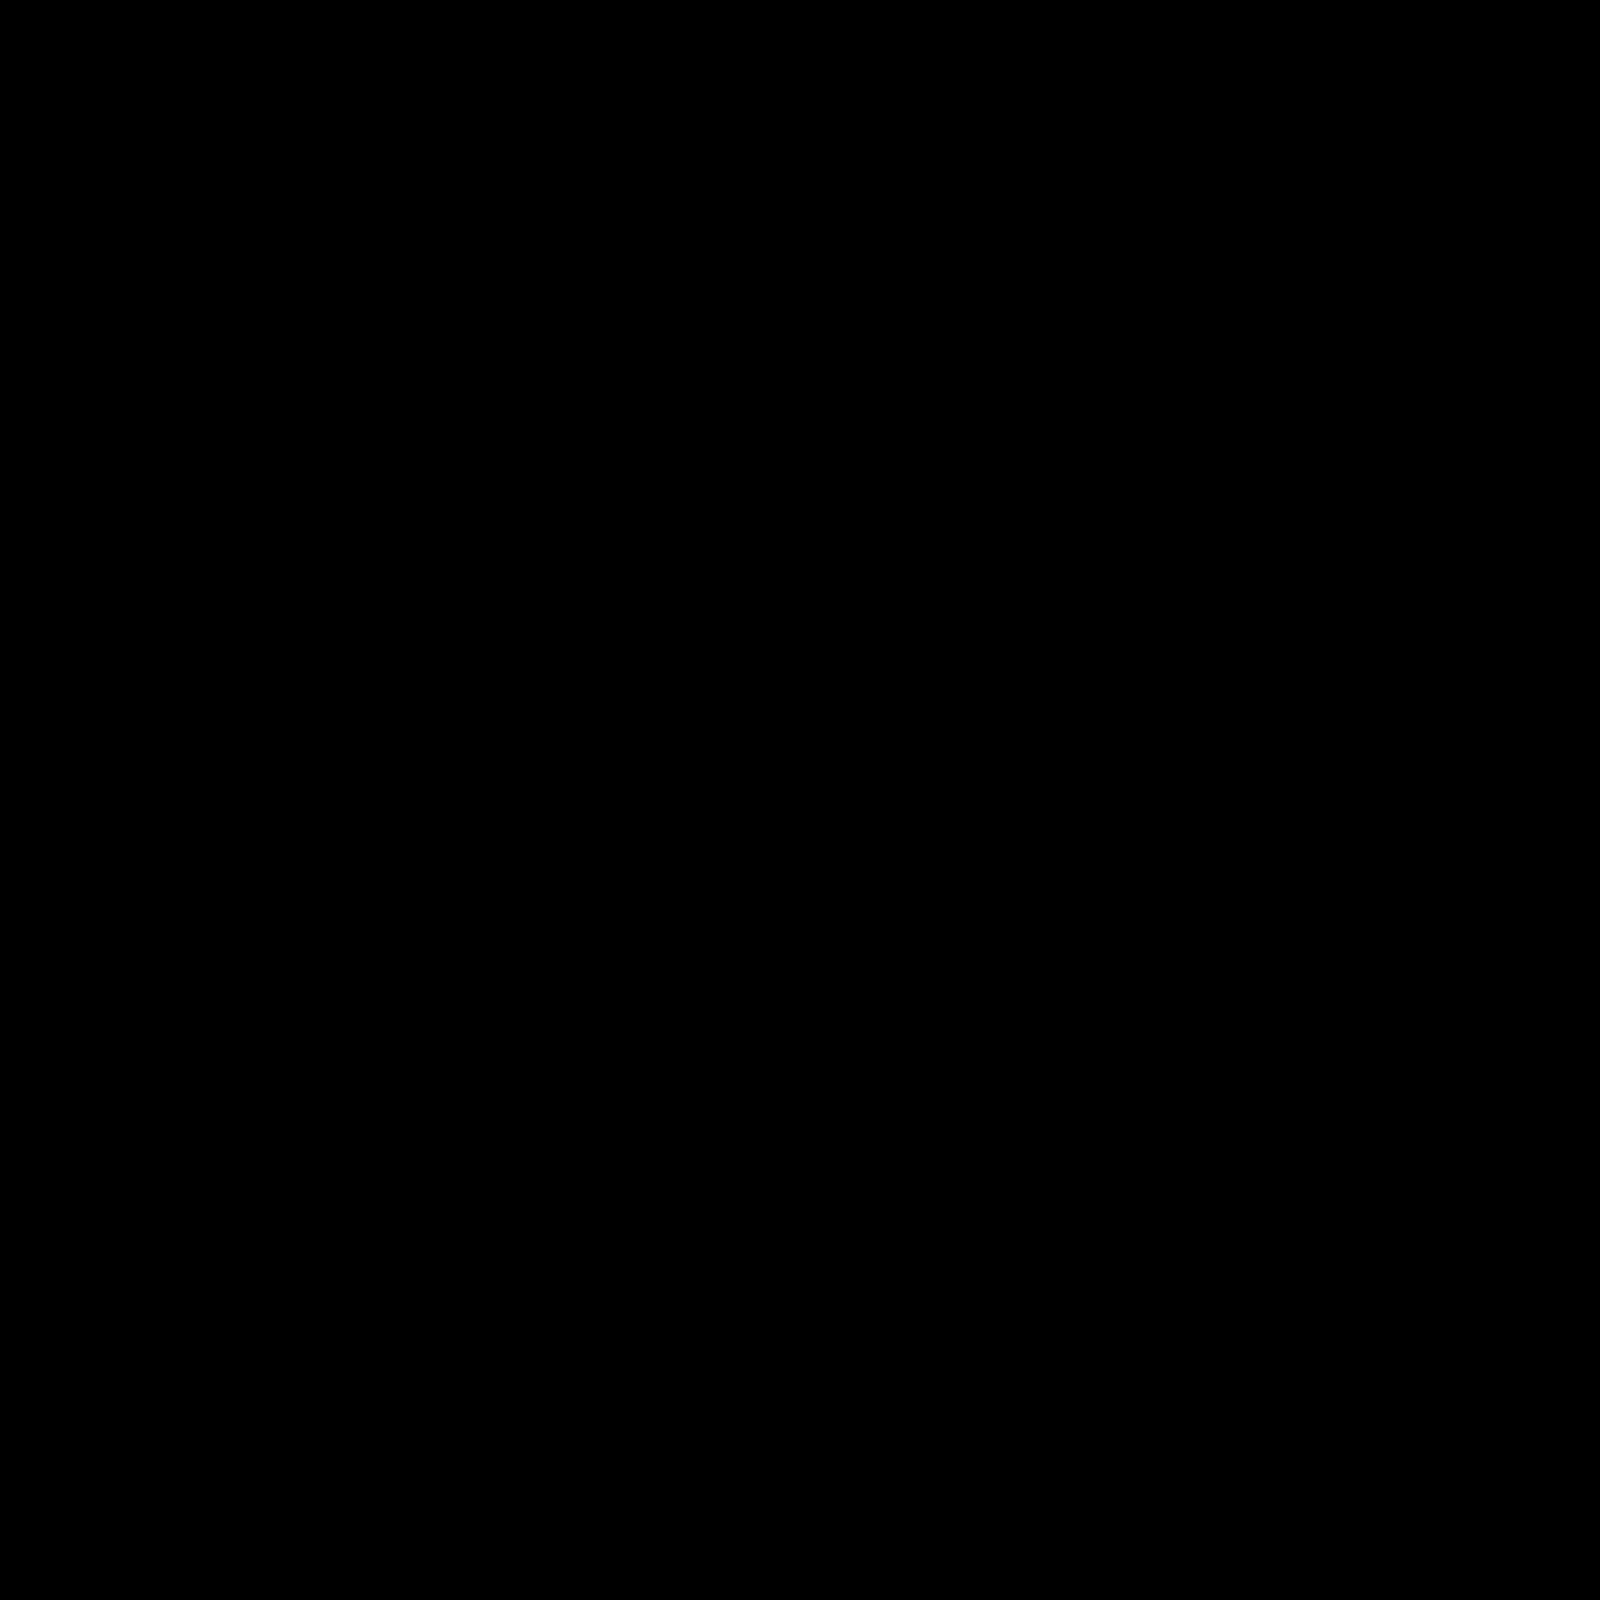 5 of Spades icon